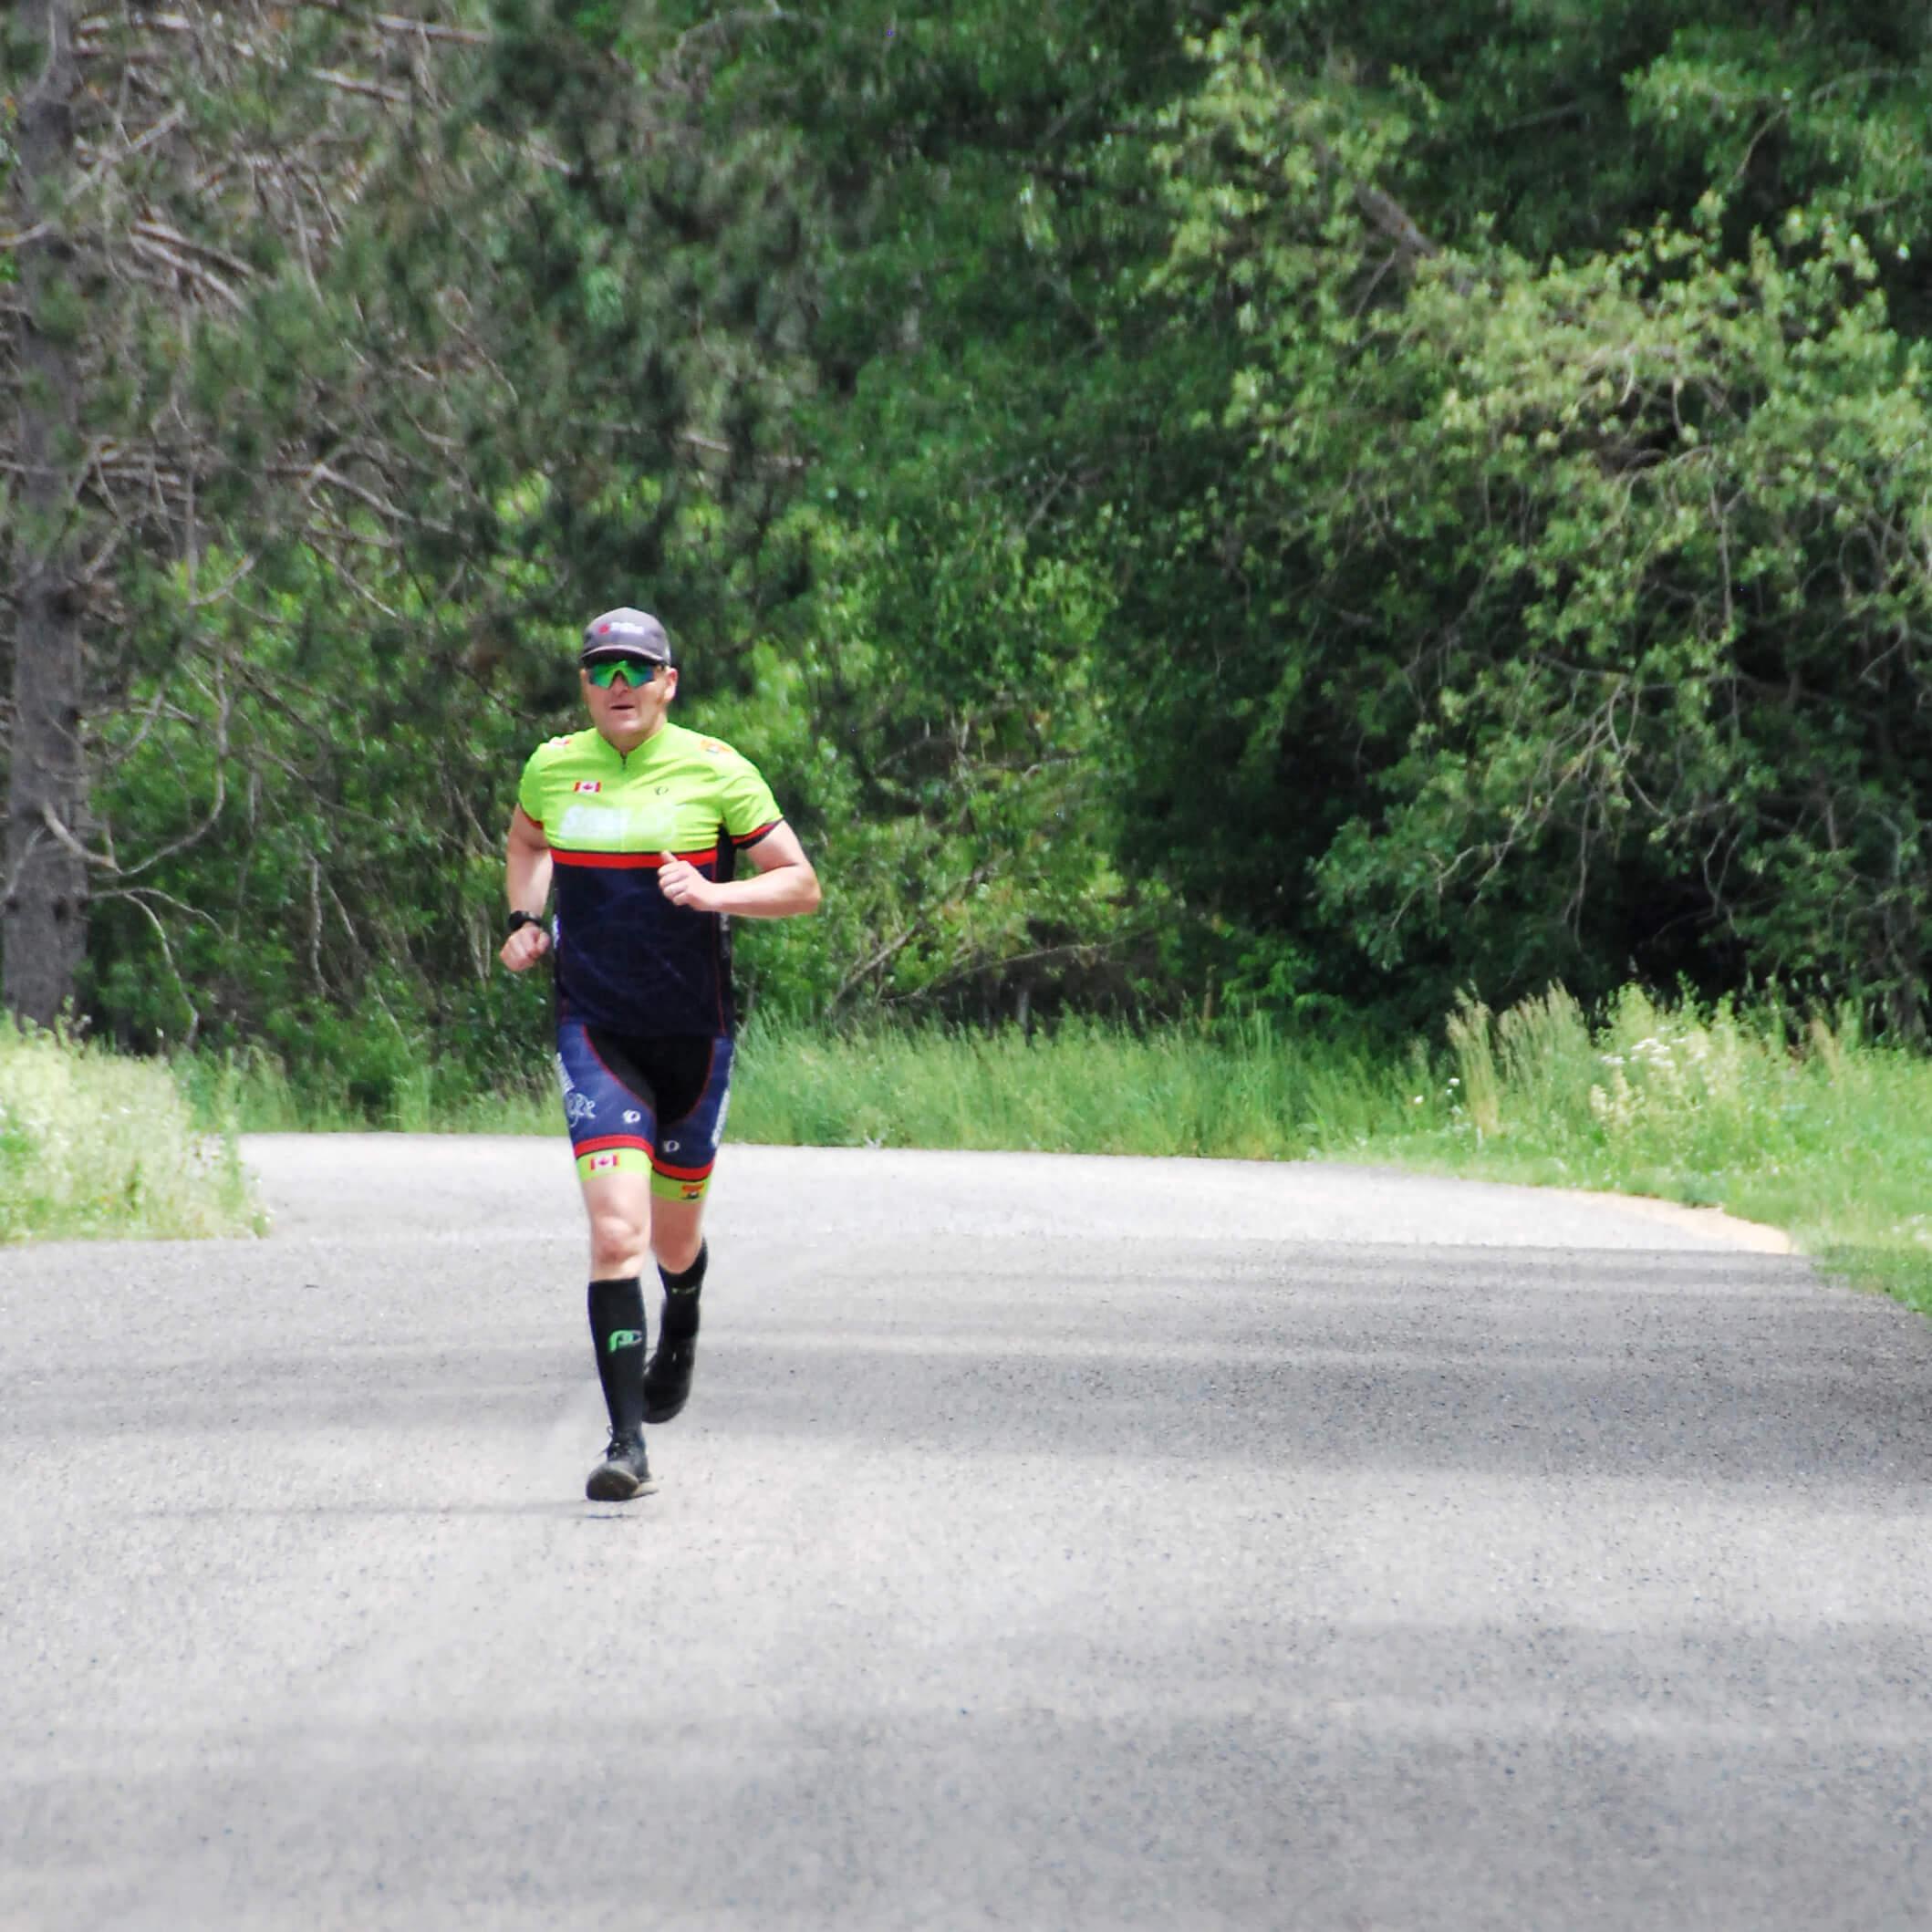 triathlete running on dirt road